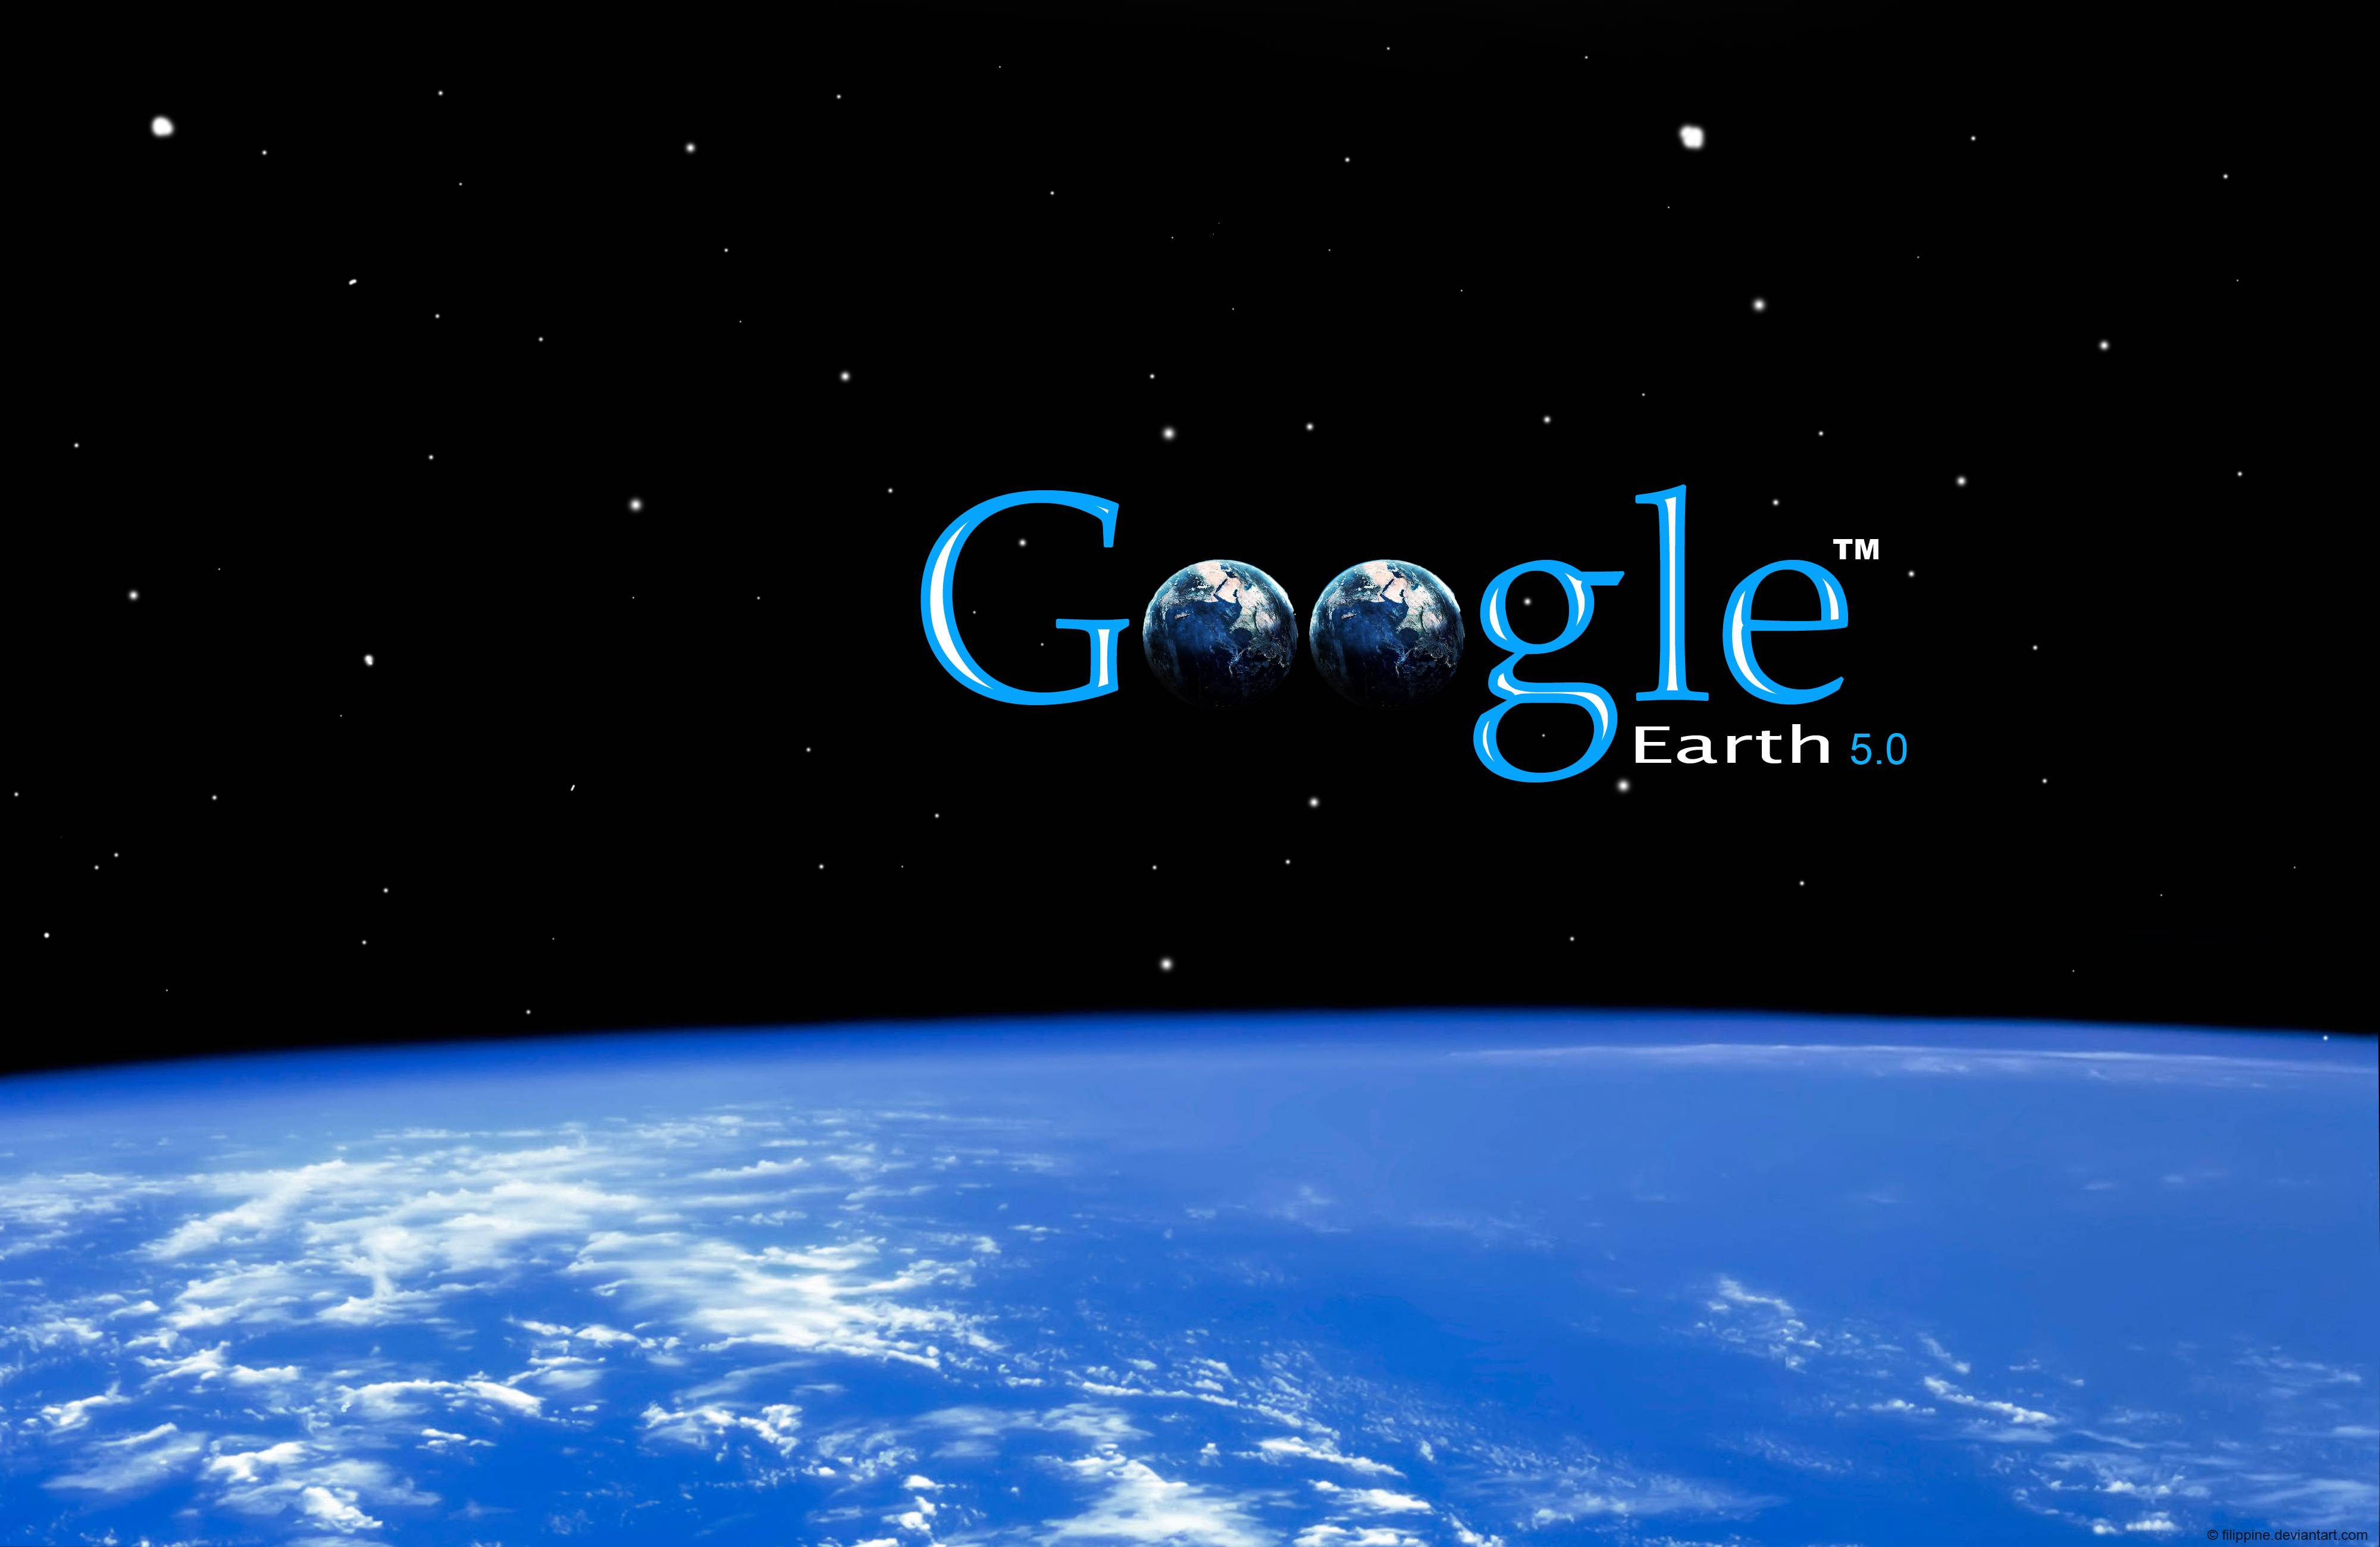 Themes za google - Google Hd Wallpaper Download Large High Resolution Desktop Theme